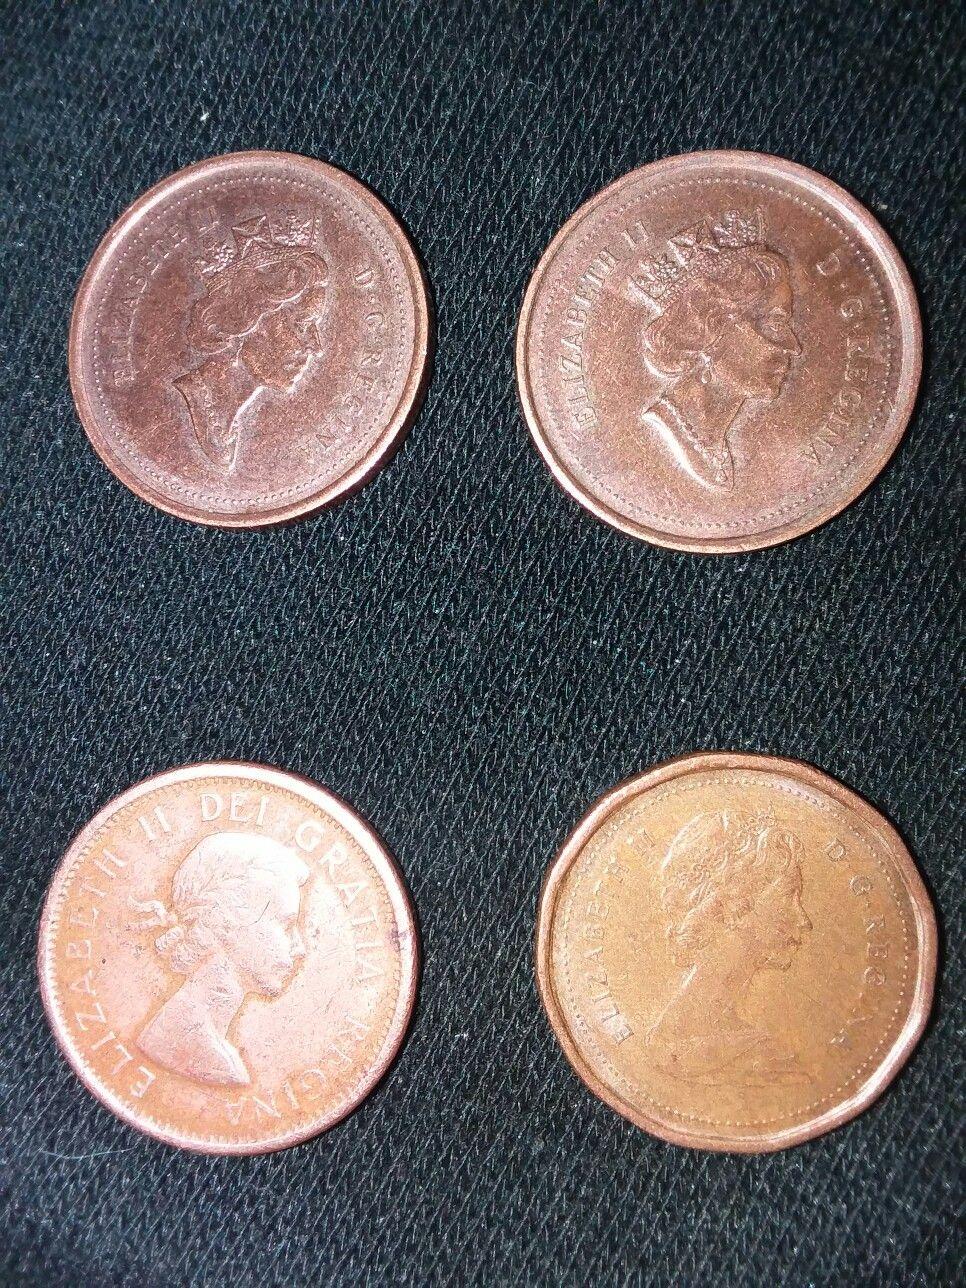 Pin by Phillip Conger on 3 3 grams GRATIA 1964 ,1982 2 5